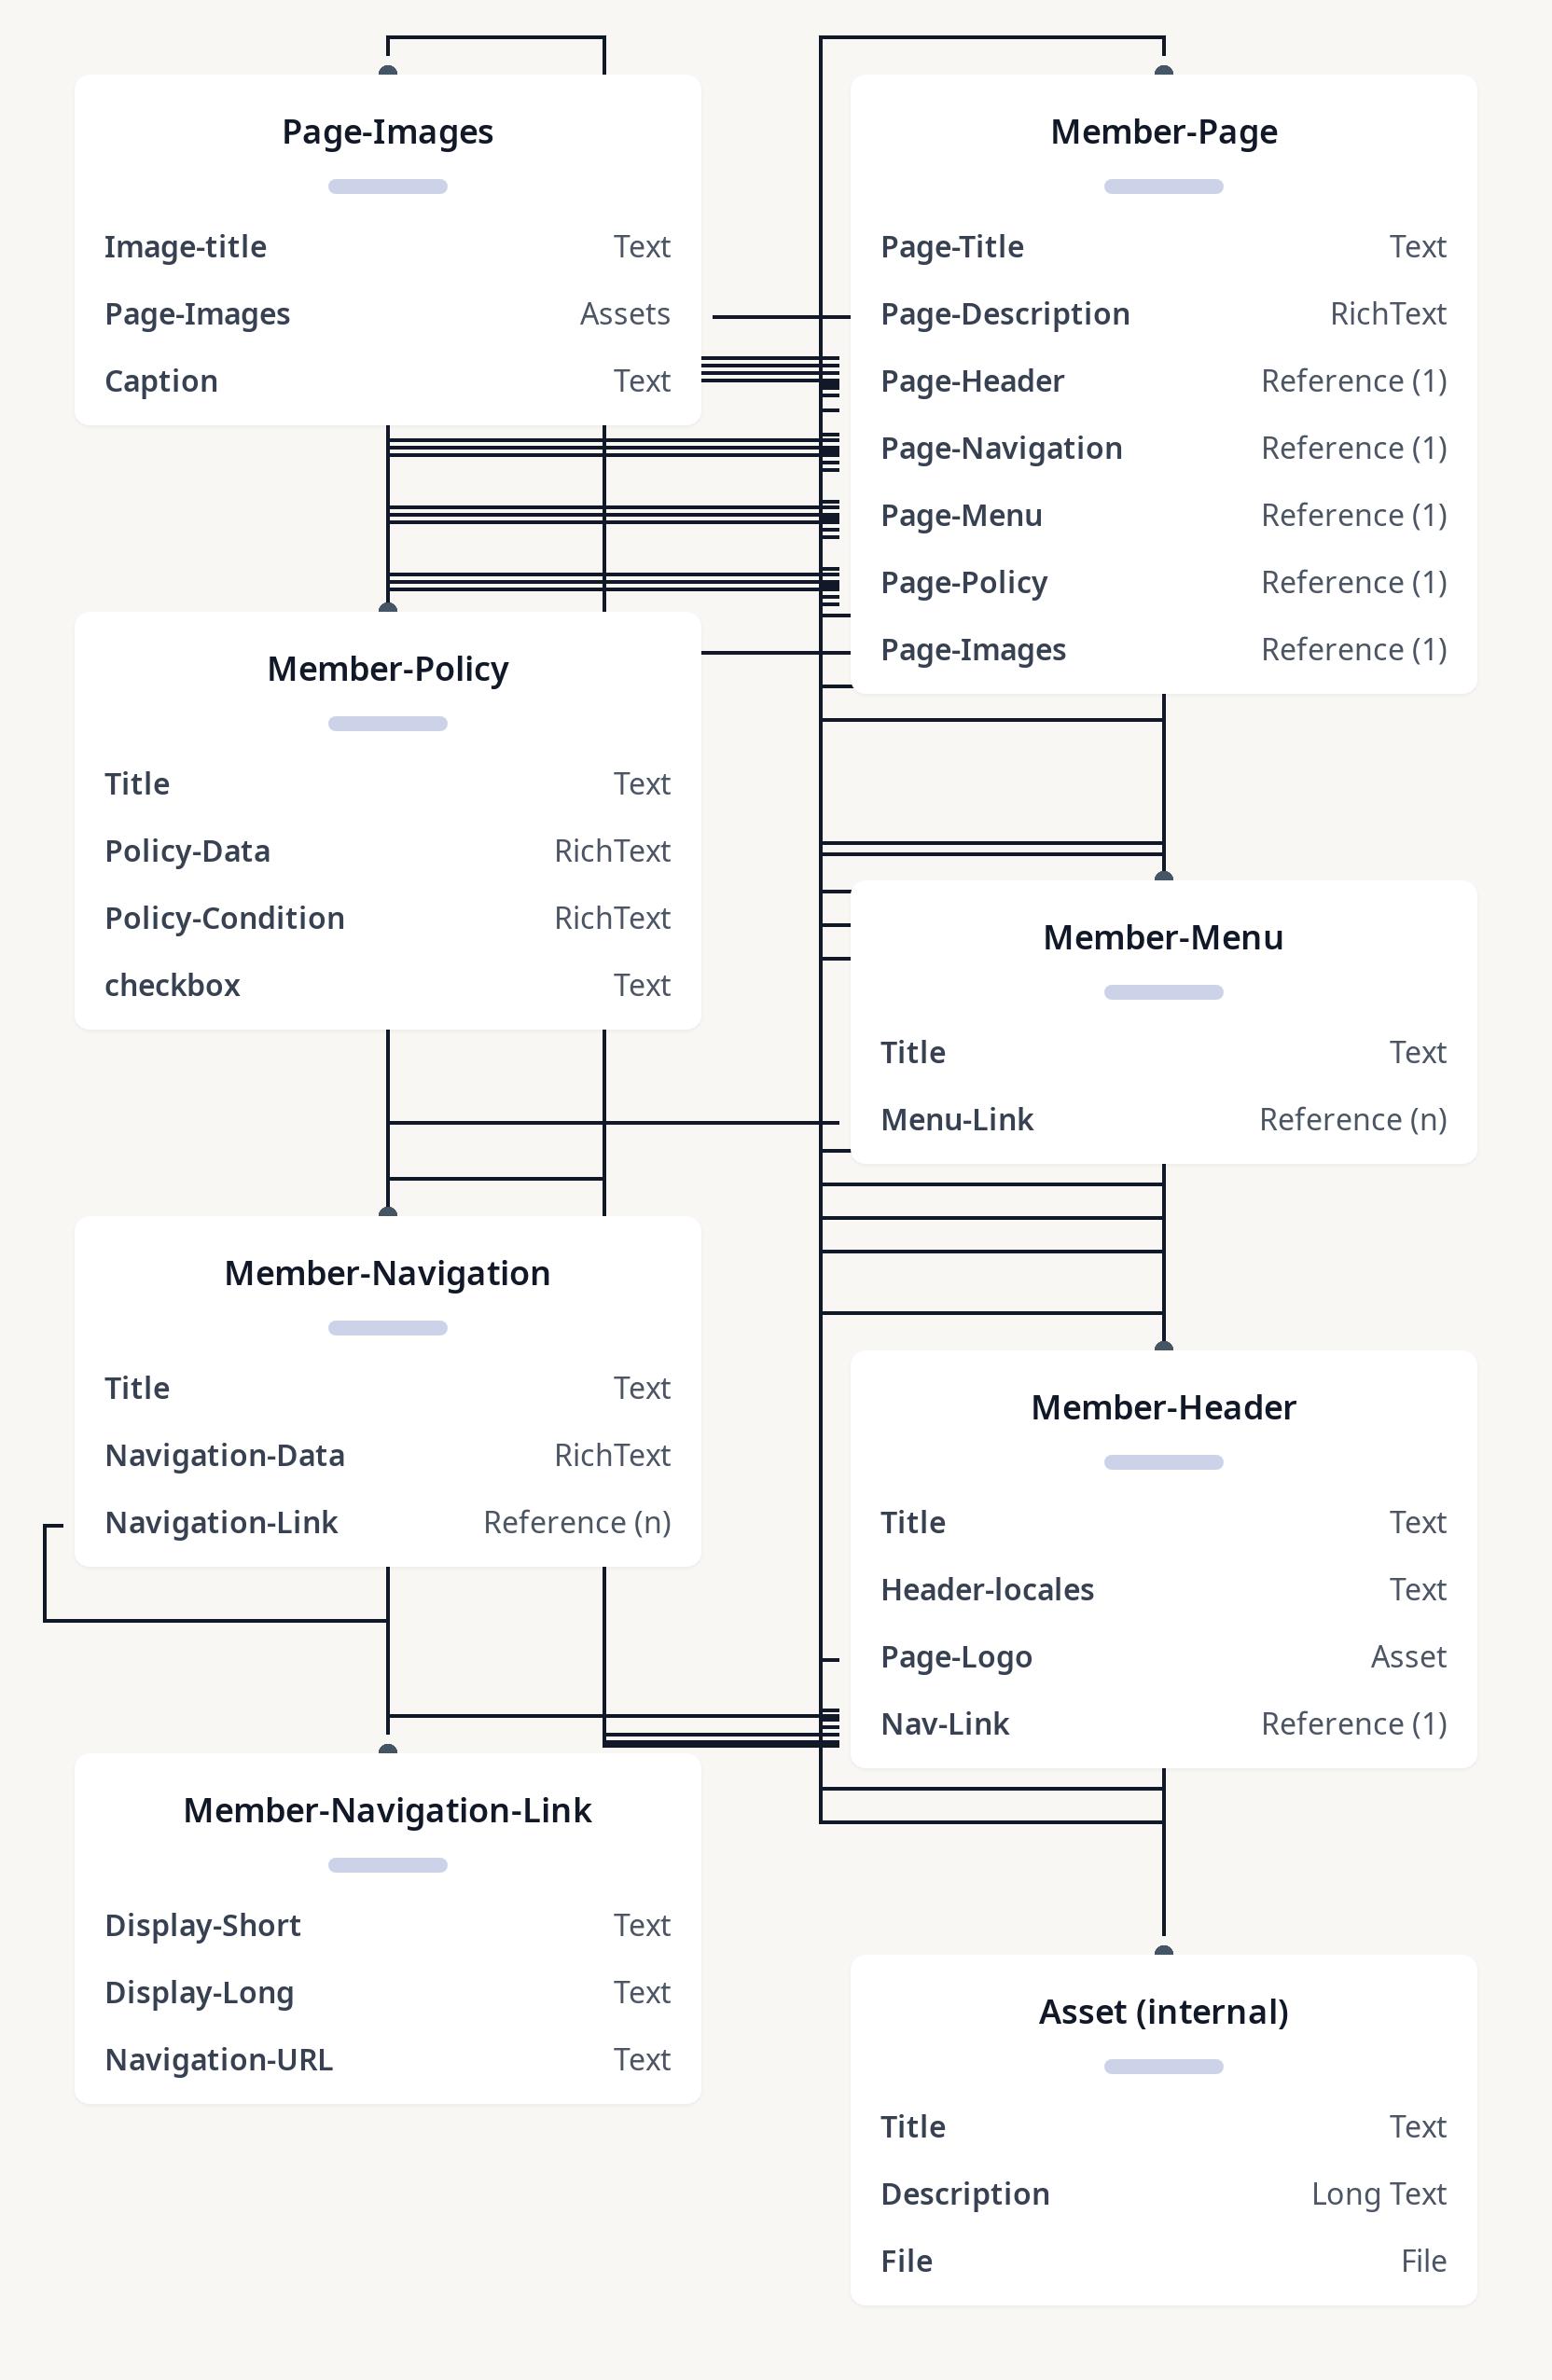 Diagram of member page